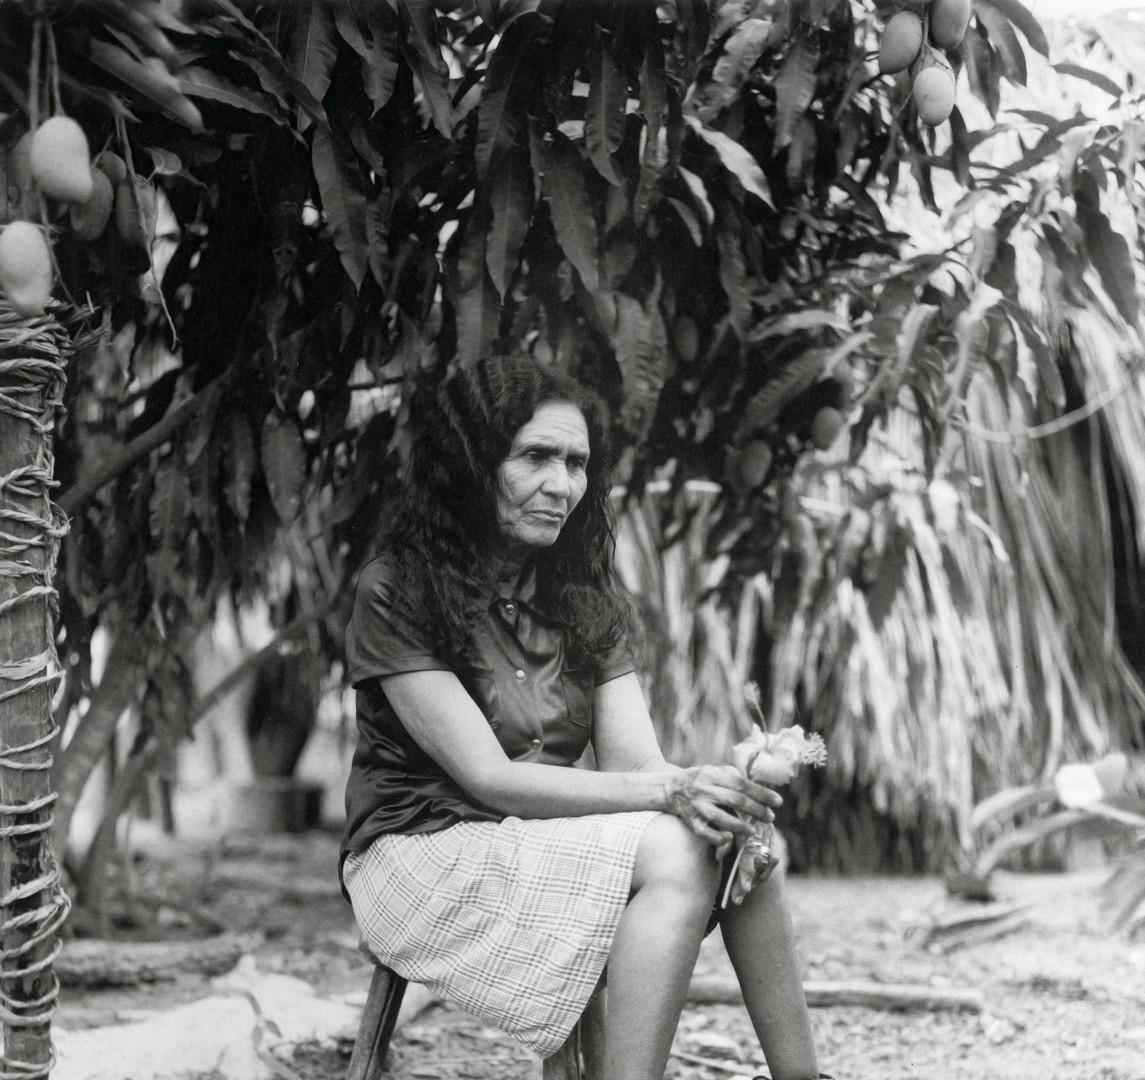 Fazal Sheikh, Dona Nika, Grande Sertao Veredas National Park, Brazil, 2001